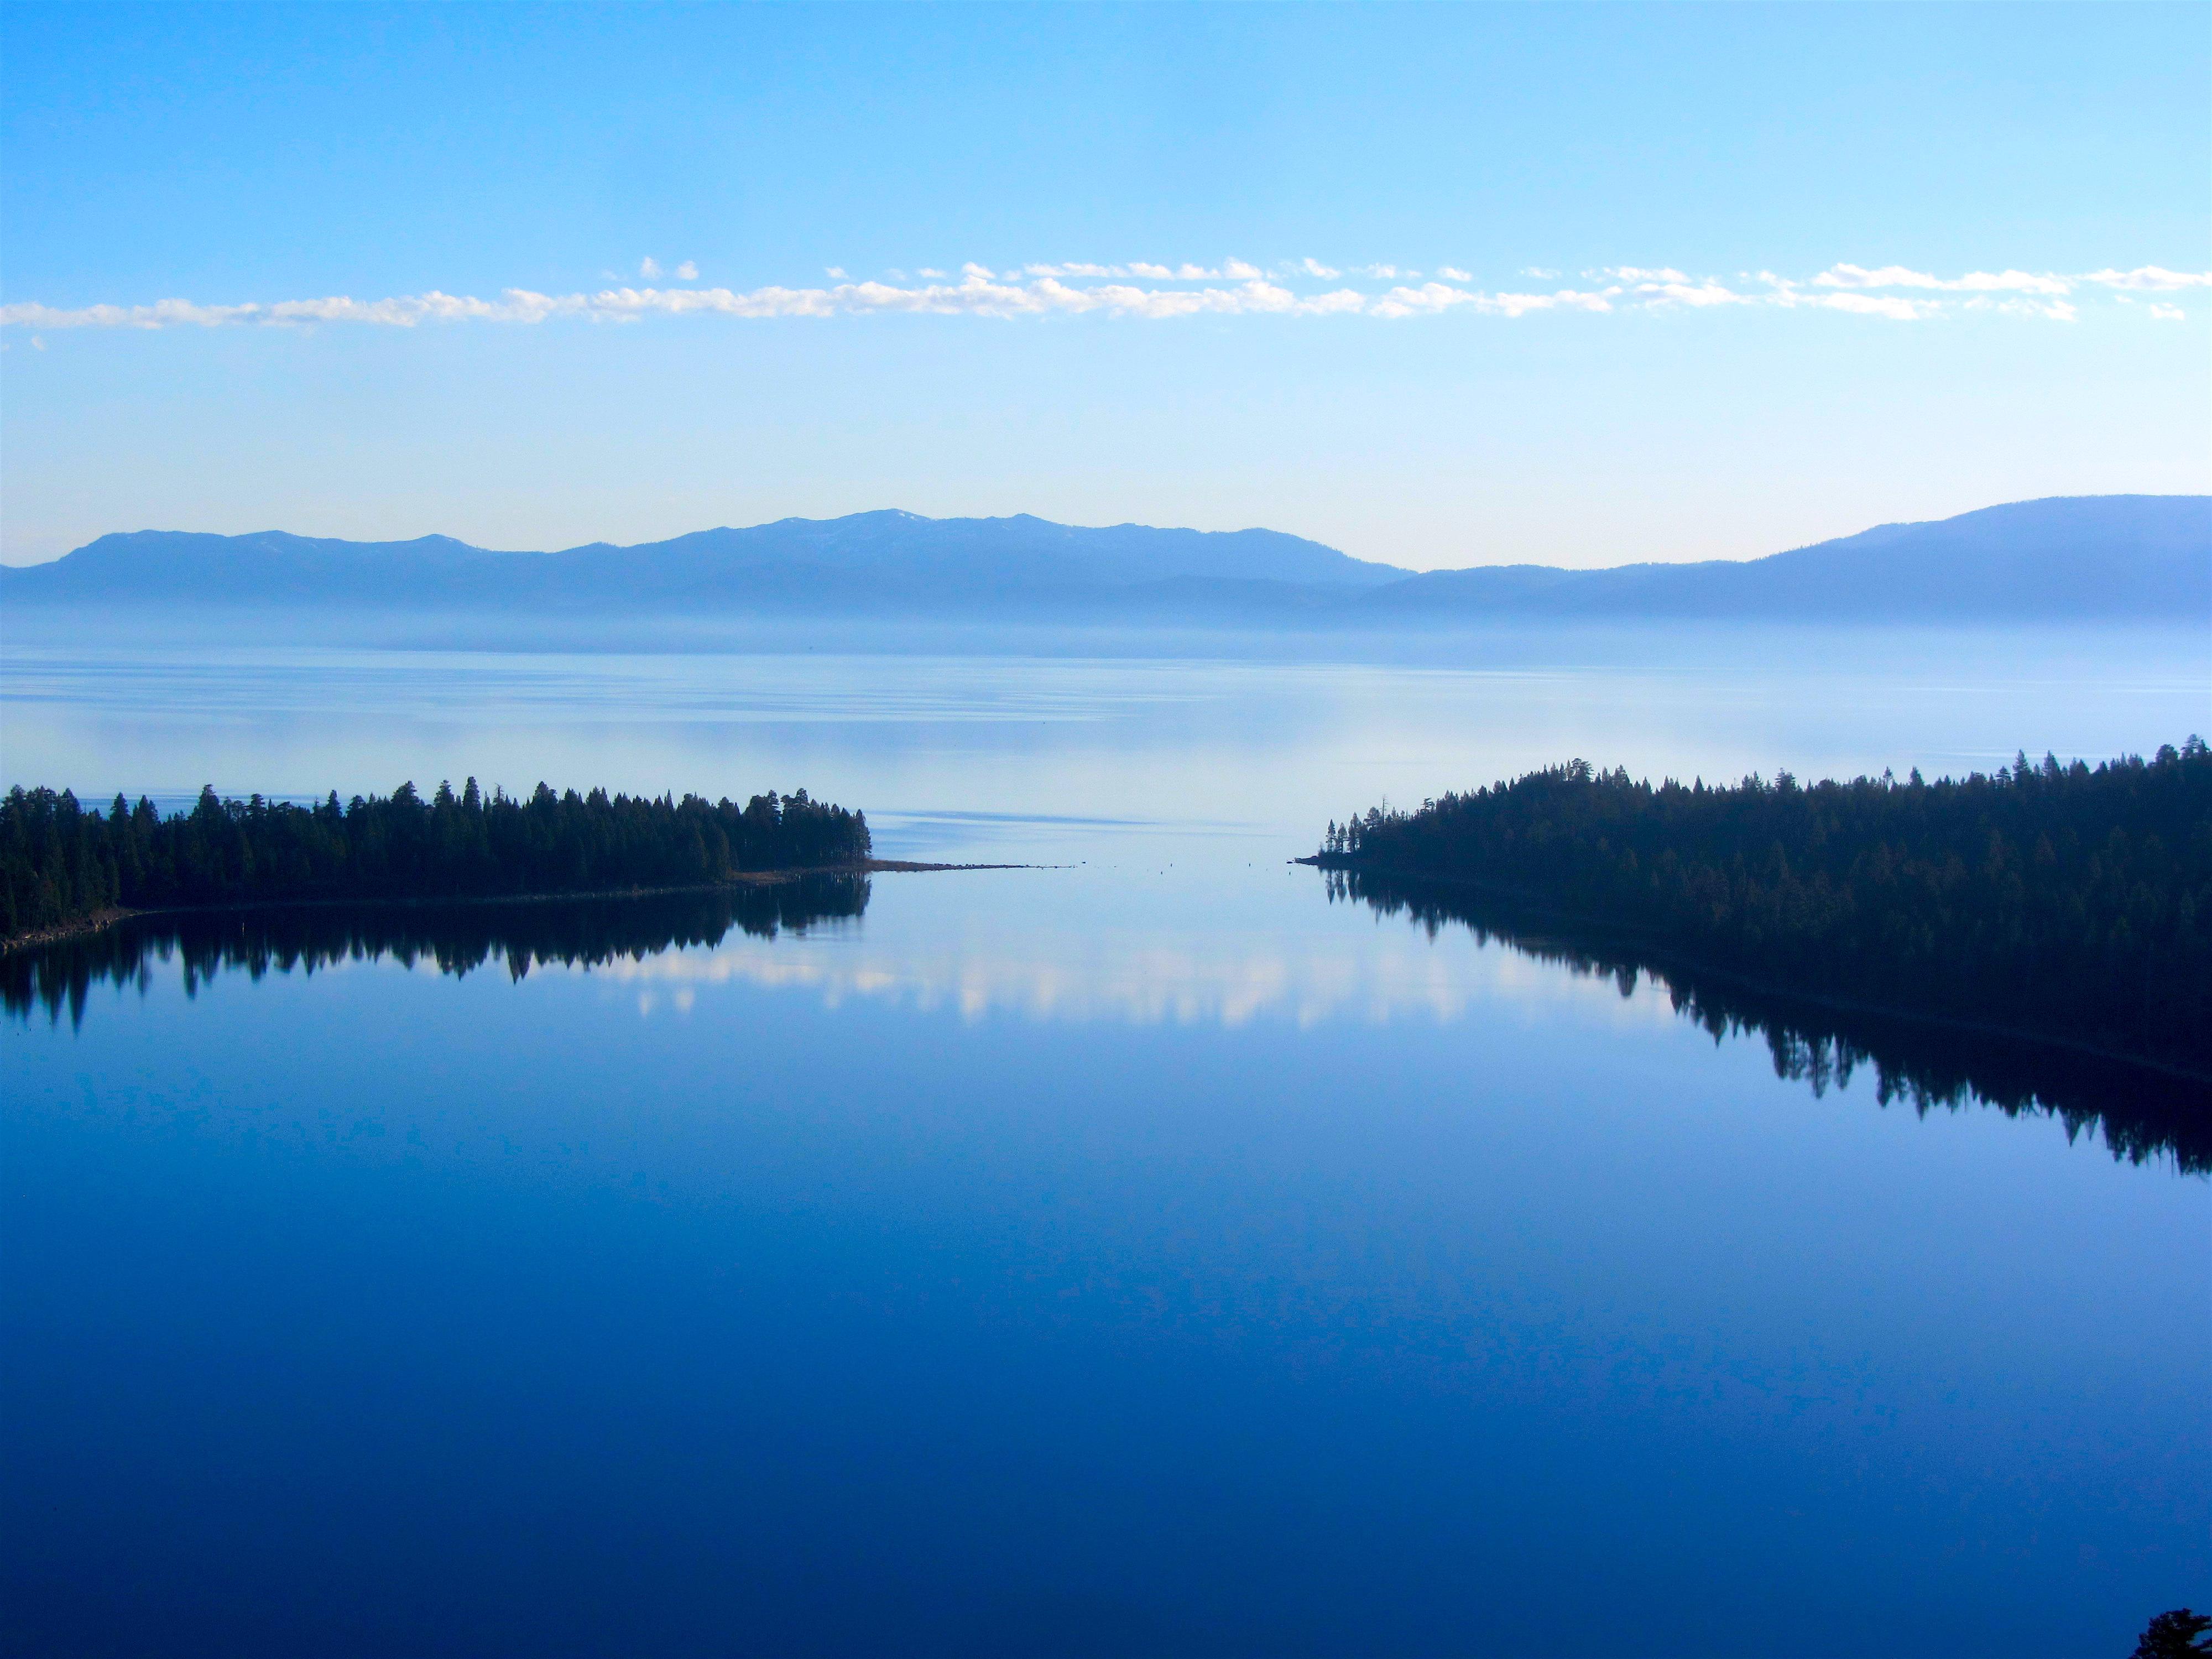 Emerald Bay, Lake Tahoe, CA this morning. photo: miles clark/snowbrains